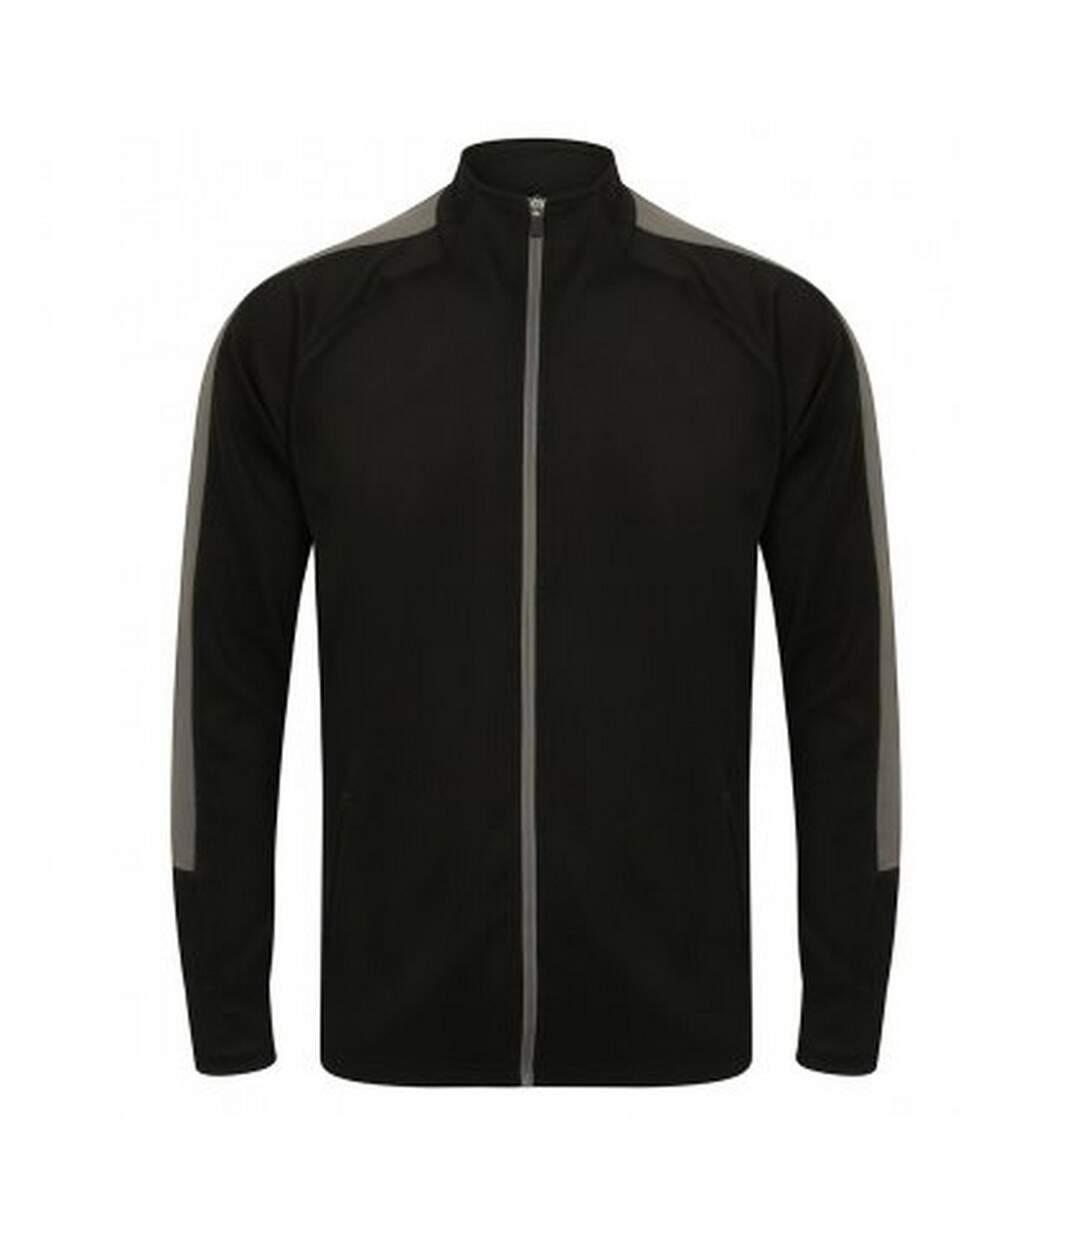 Finden And Hales Mens Knitted Tracksuit Top (Black/Gunmetal Grey) - UTPC3354